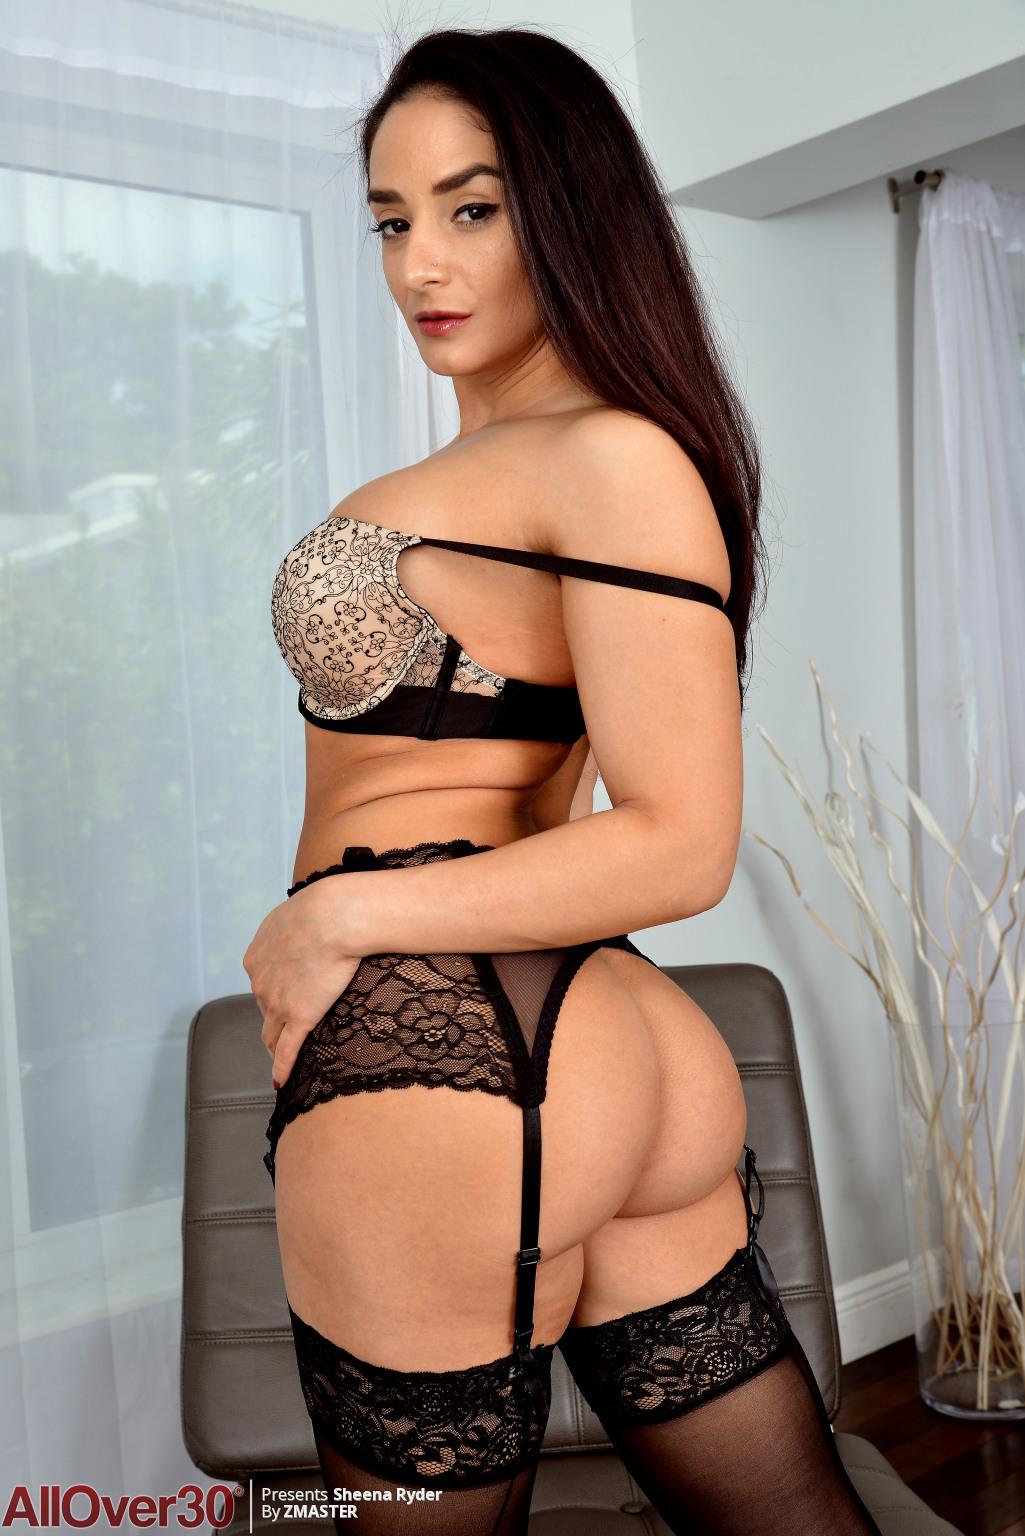 big-tits-beauty-sheena-ryder-04